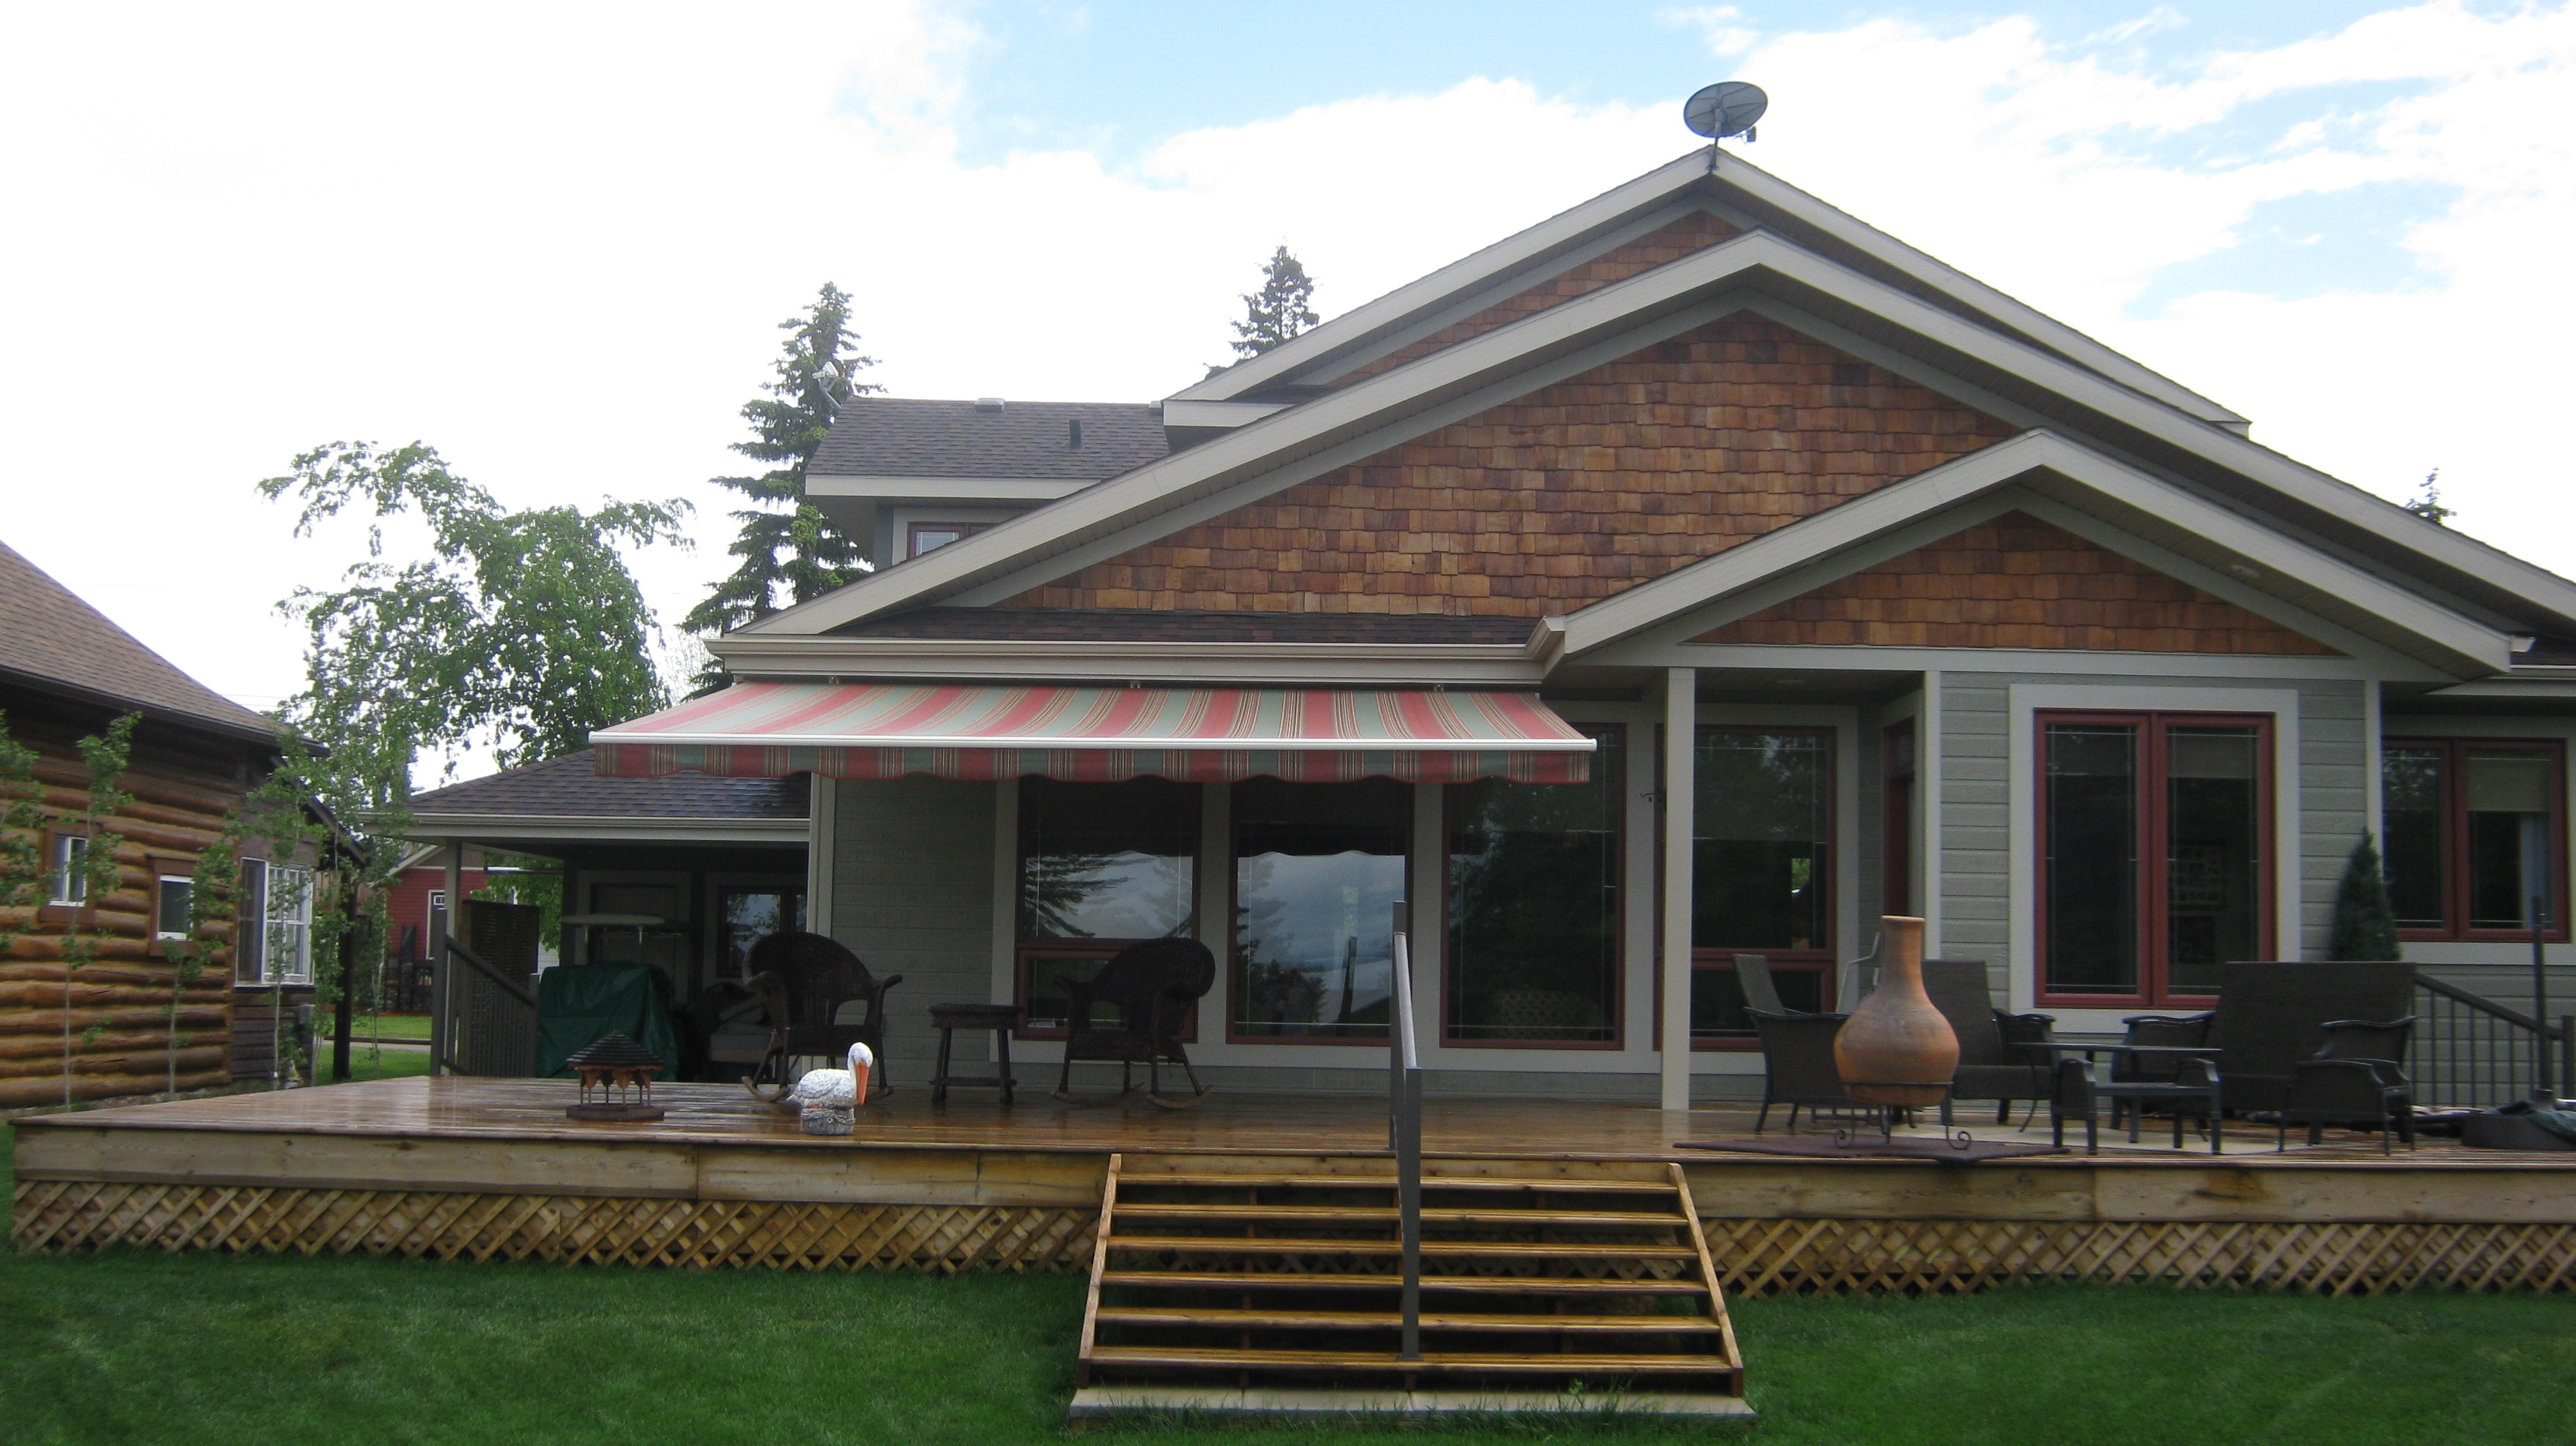 Residential Edmonton Tent Amp Awning